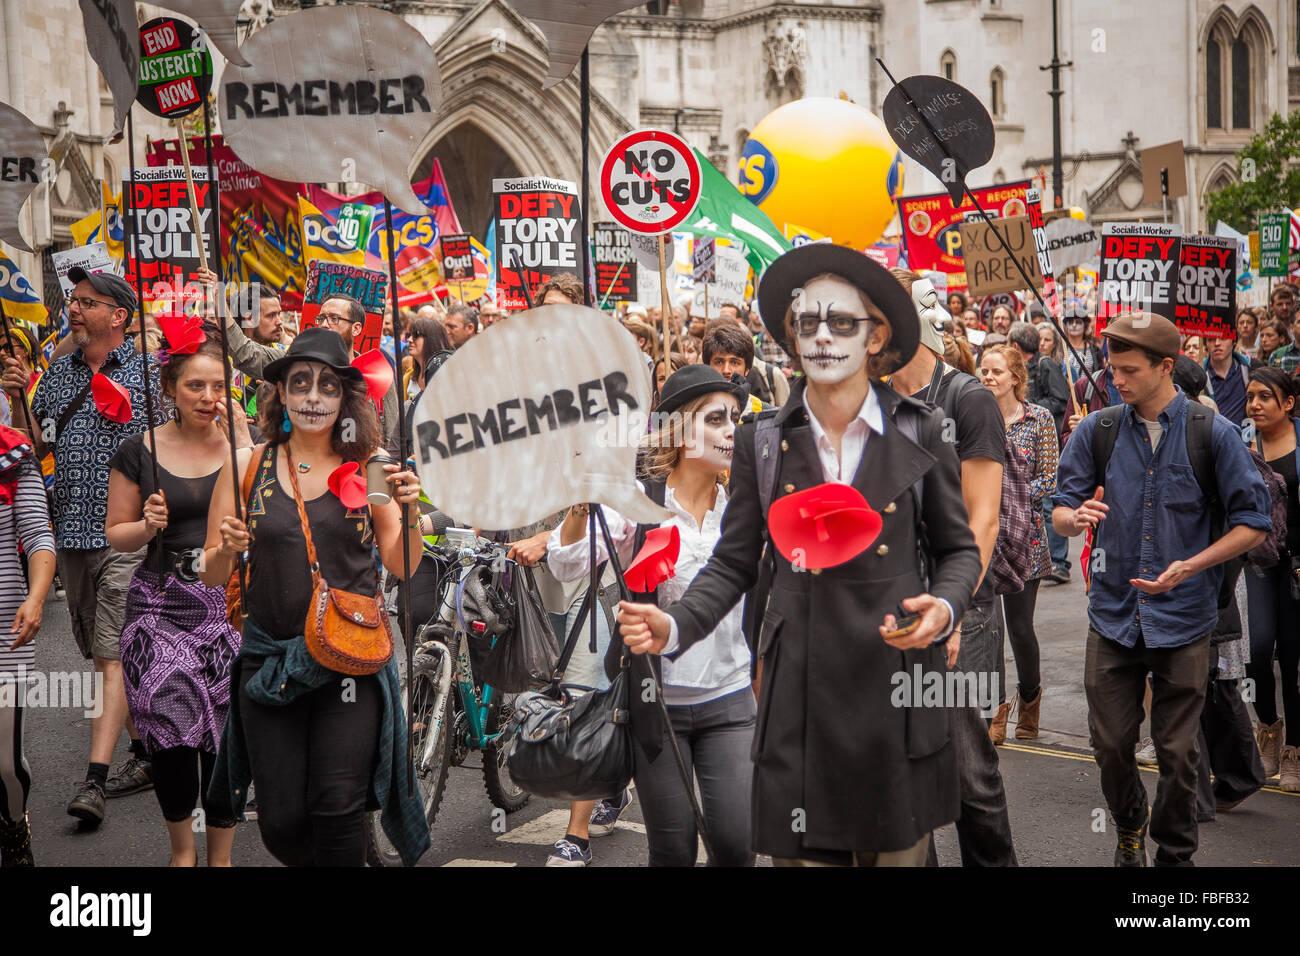 Funky Anti-Austerity Protesters June 2015 London, UK - Stock Image